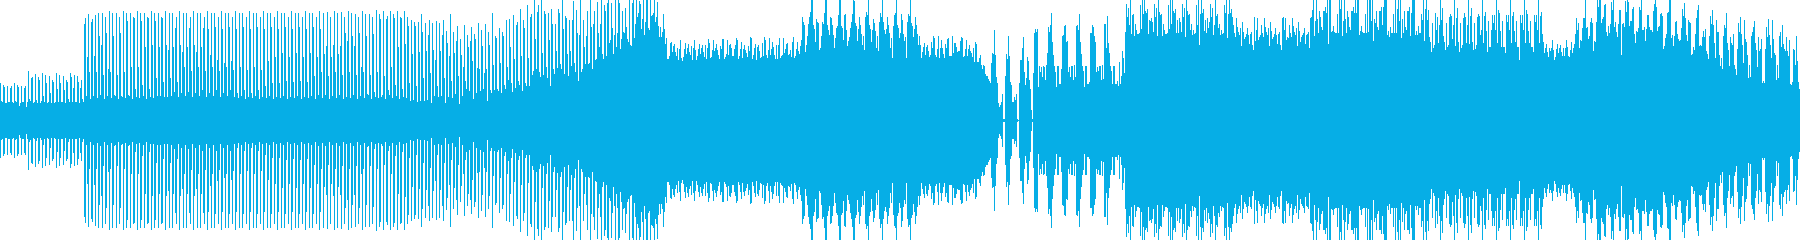 Electro.Instrumen...の再生済みの波形